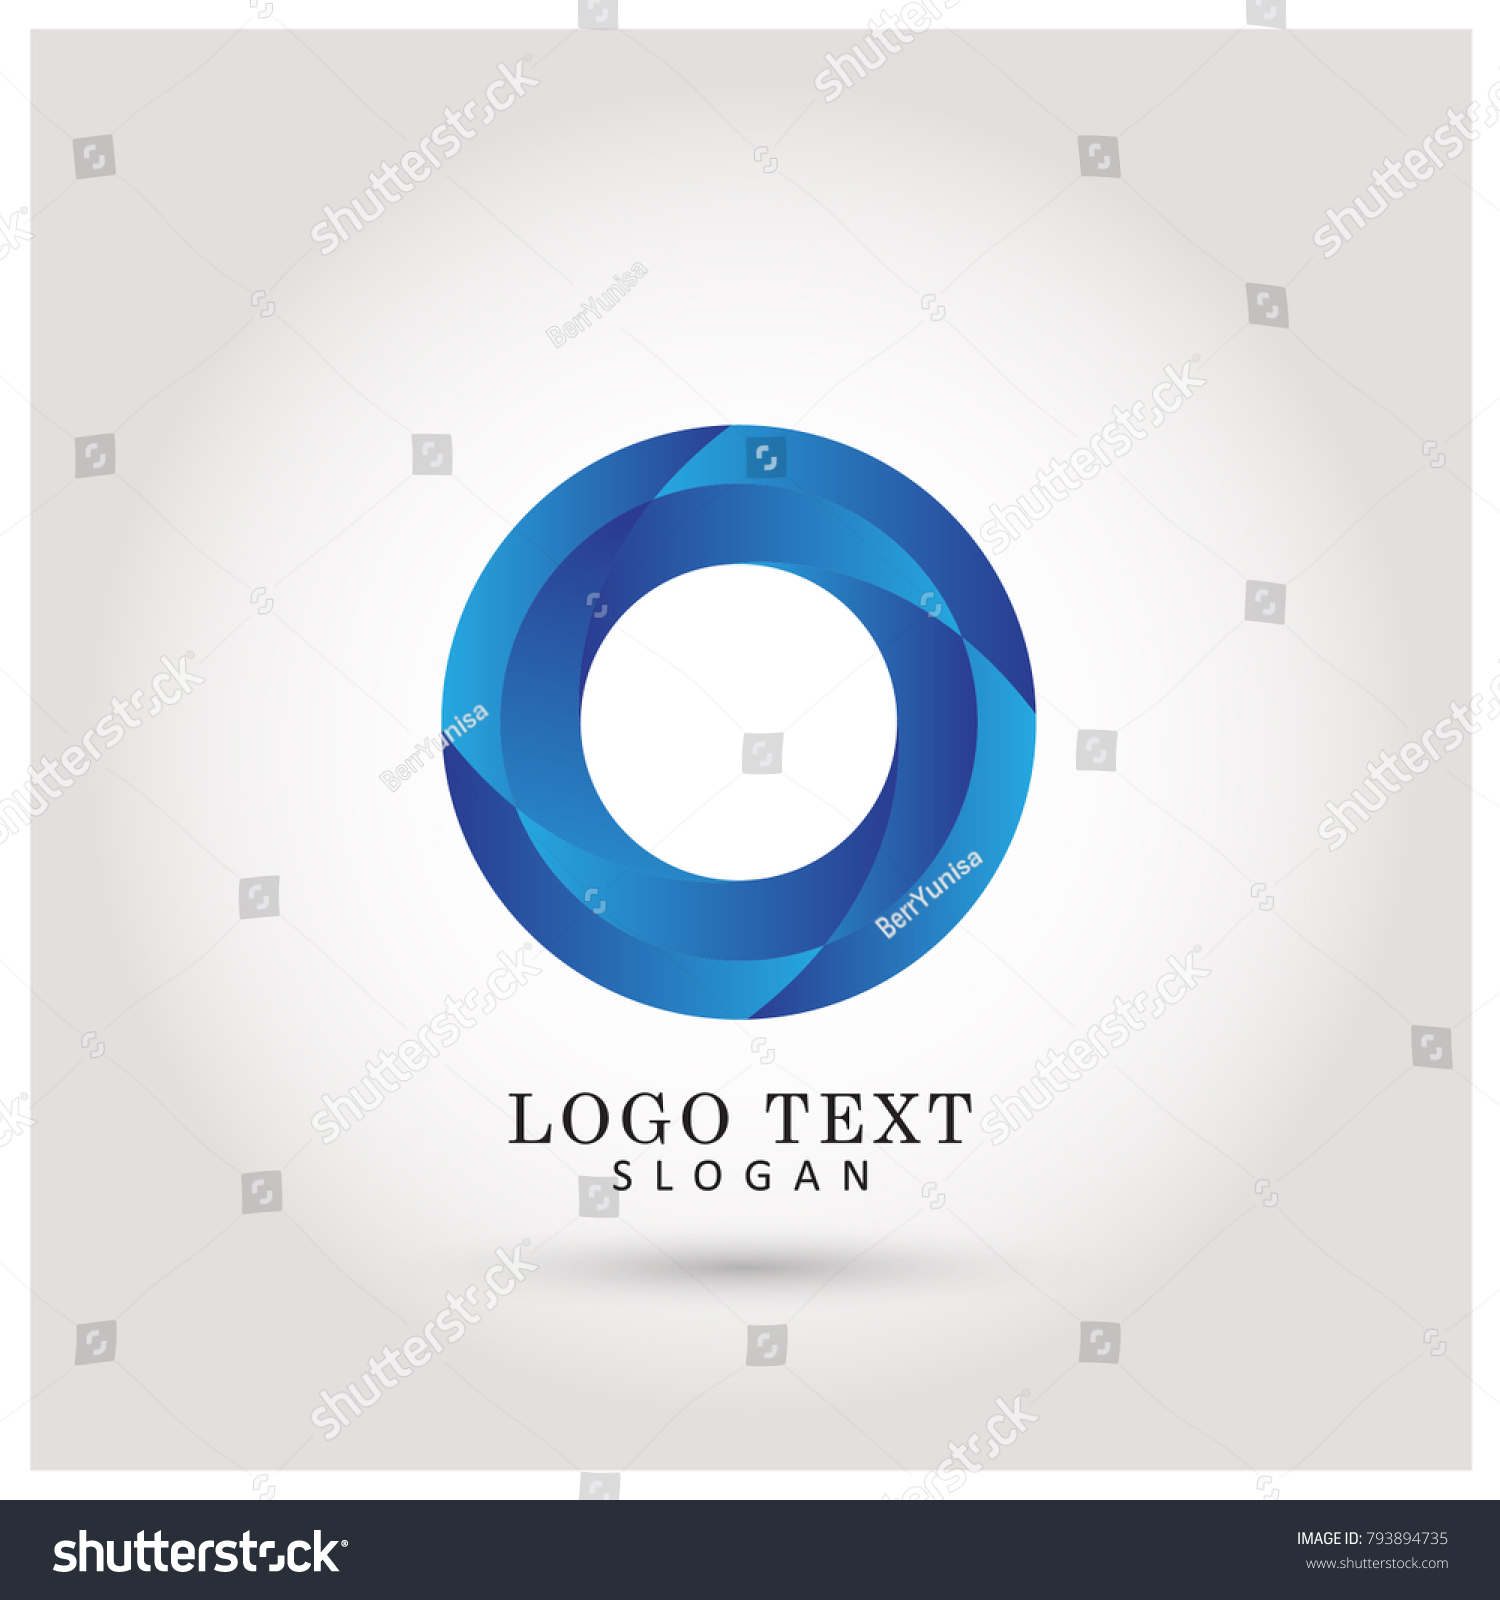 Ov kosher symbol images symbol and sign ideas stock symbol o gallery symbol and sign ideas modern circle o logo symbol icon stock vector biocorpaavc